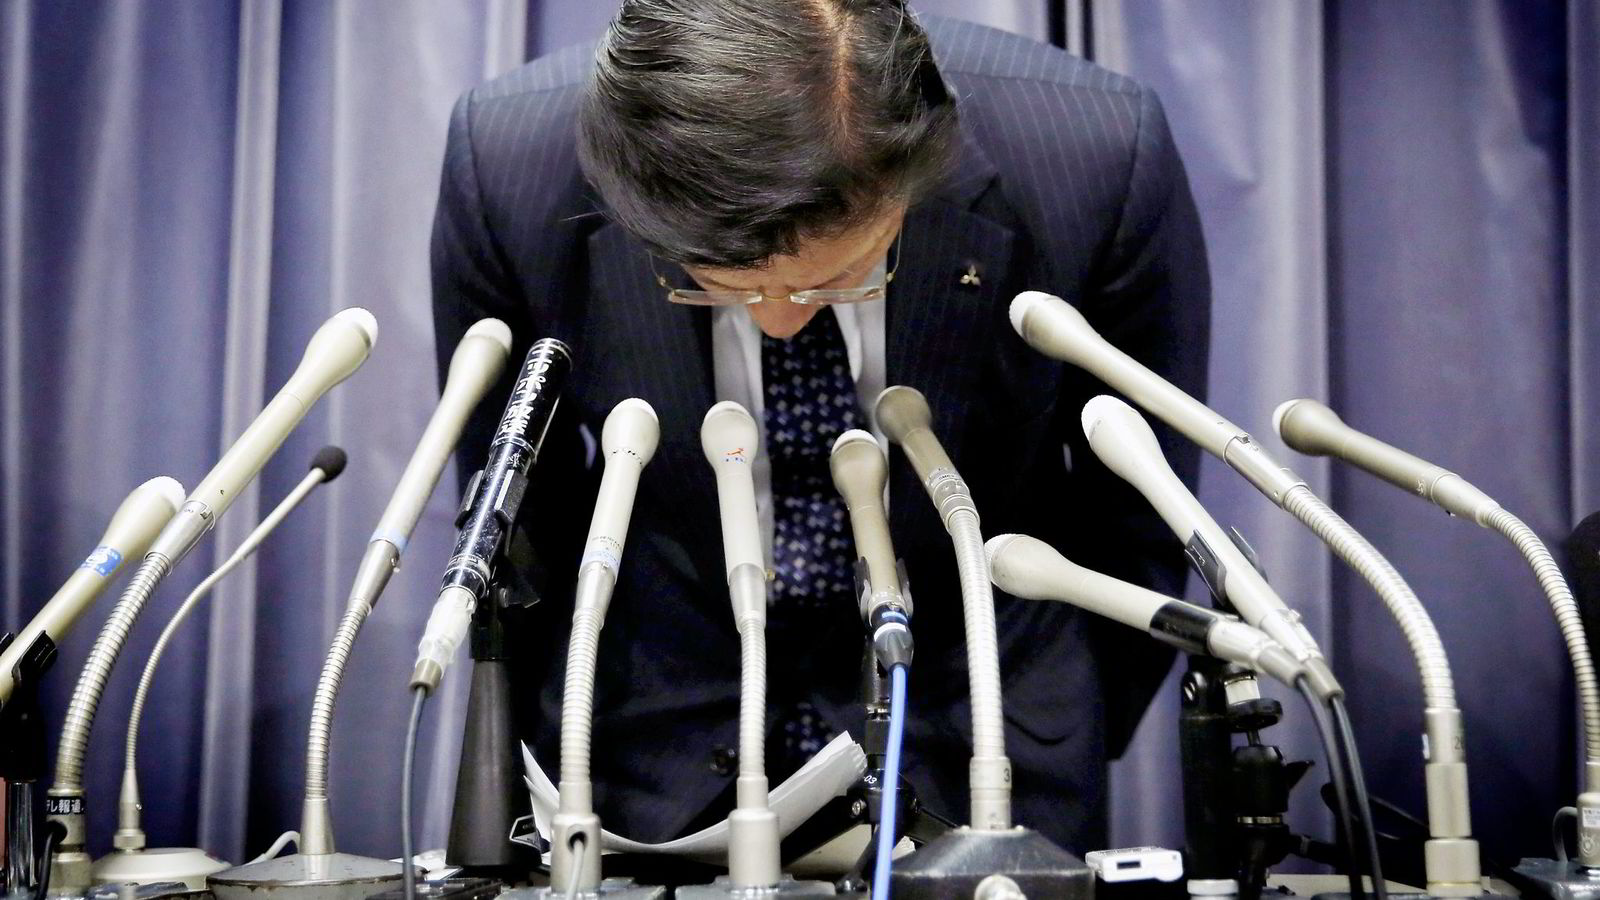 Konsernsjef Tetsuro Aikawa i Mitsubishi Motors bukket dypt foran kameraene på pressekonferansen onsdag før han bekreftet ryktene som begynte å gå i japanske medier tidligere på dagen. Foto: Toru Hanai/Reuters/NTB Scanpix